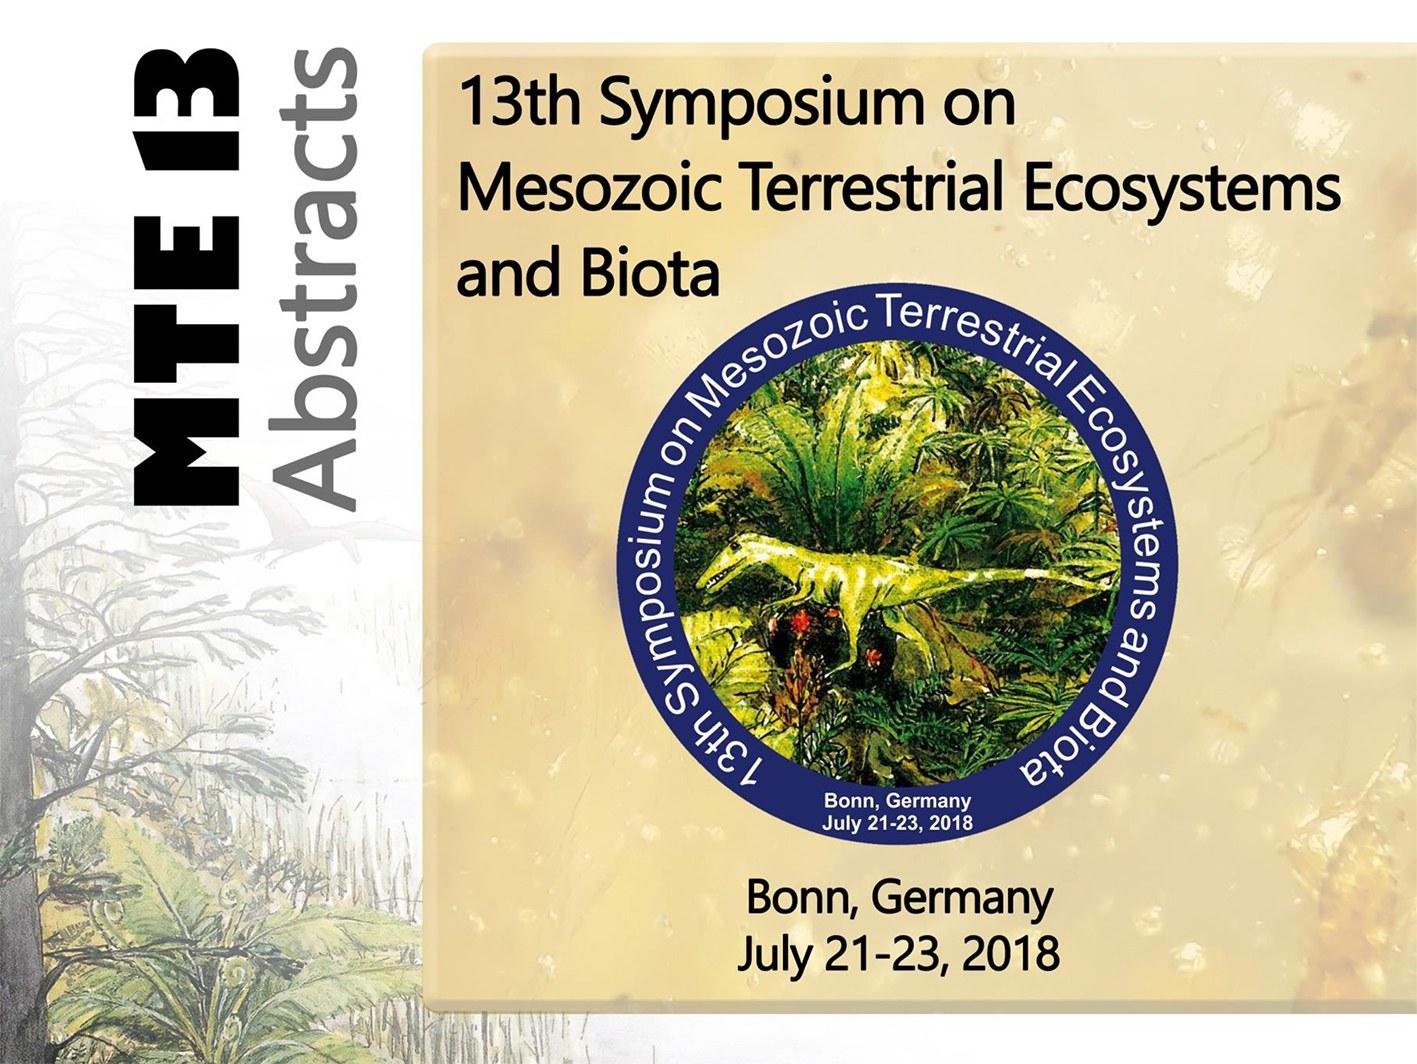 Beim 13. Symposium on Mesozoic Terrestrial Ecosystems and Biota (MTE13)